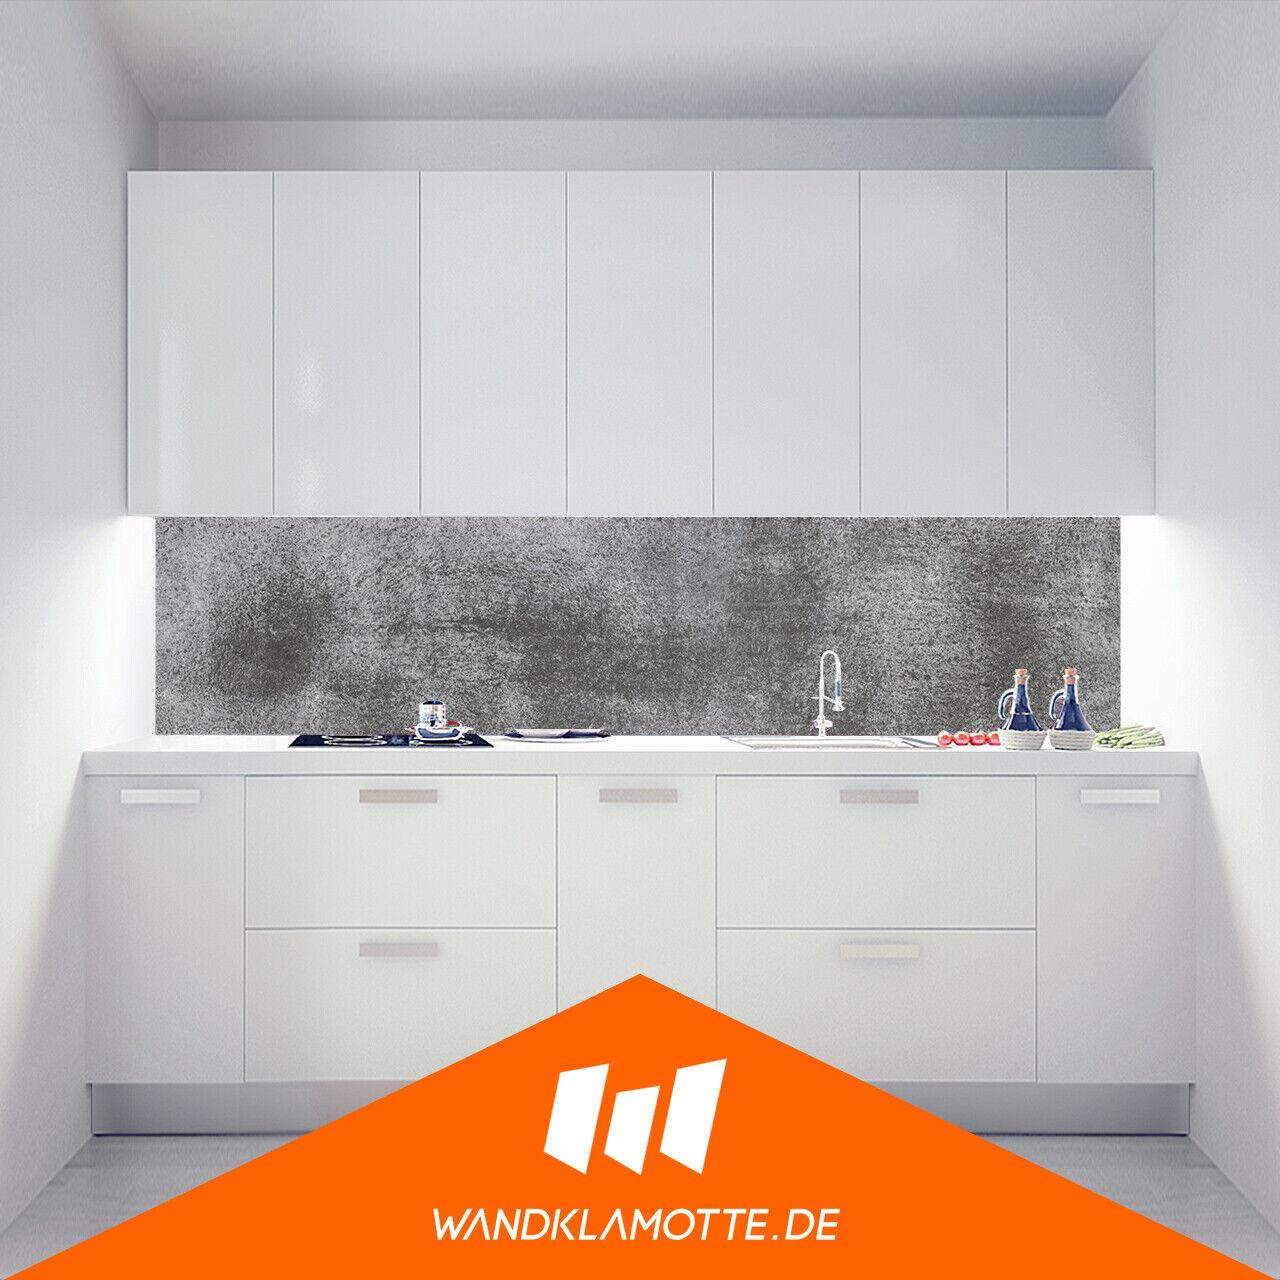 Kitchen Retro Wall Acrylic Glass Cooker Splash Guard sanded Concrete